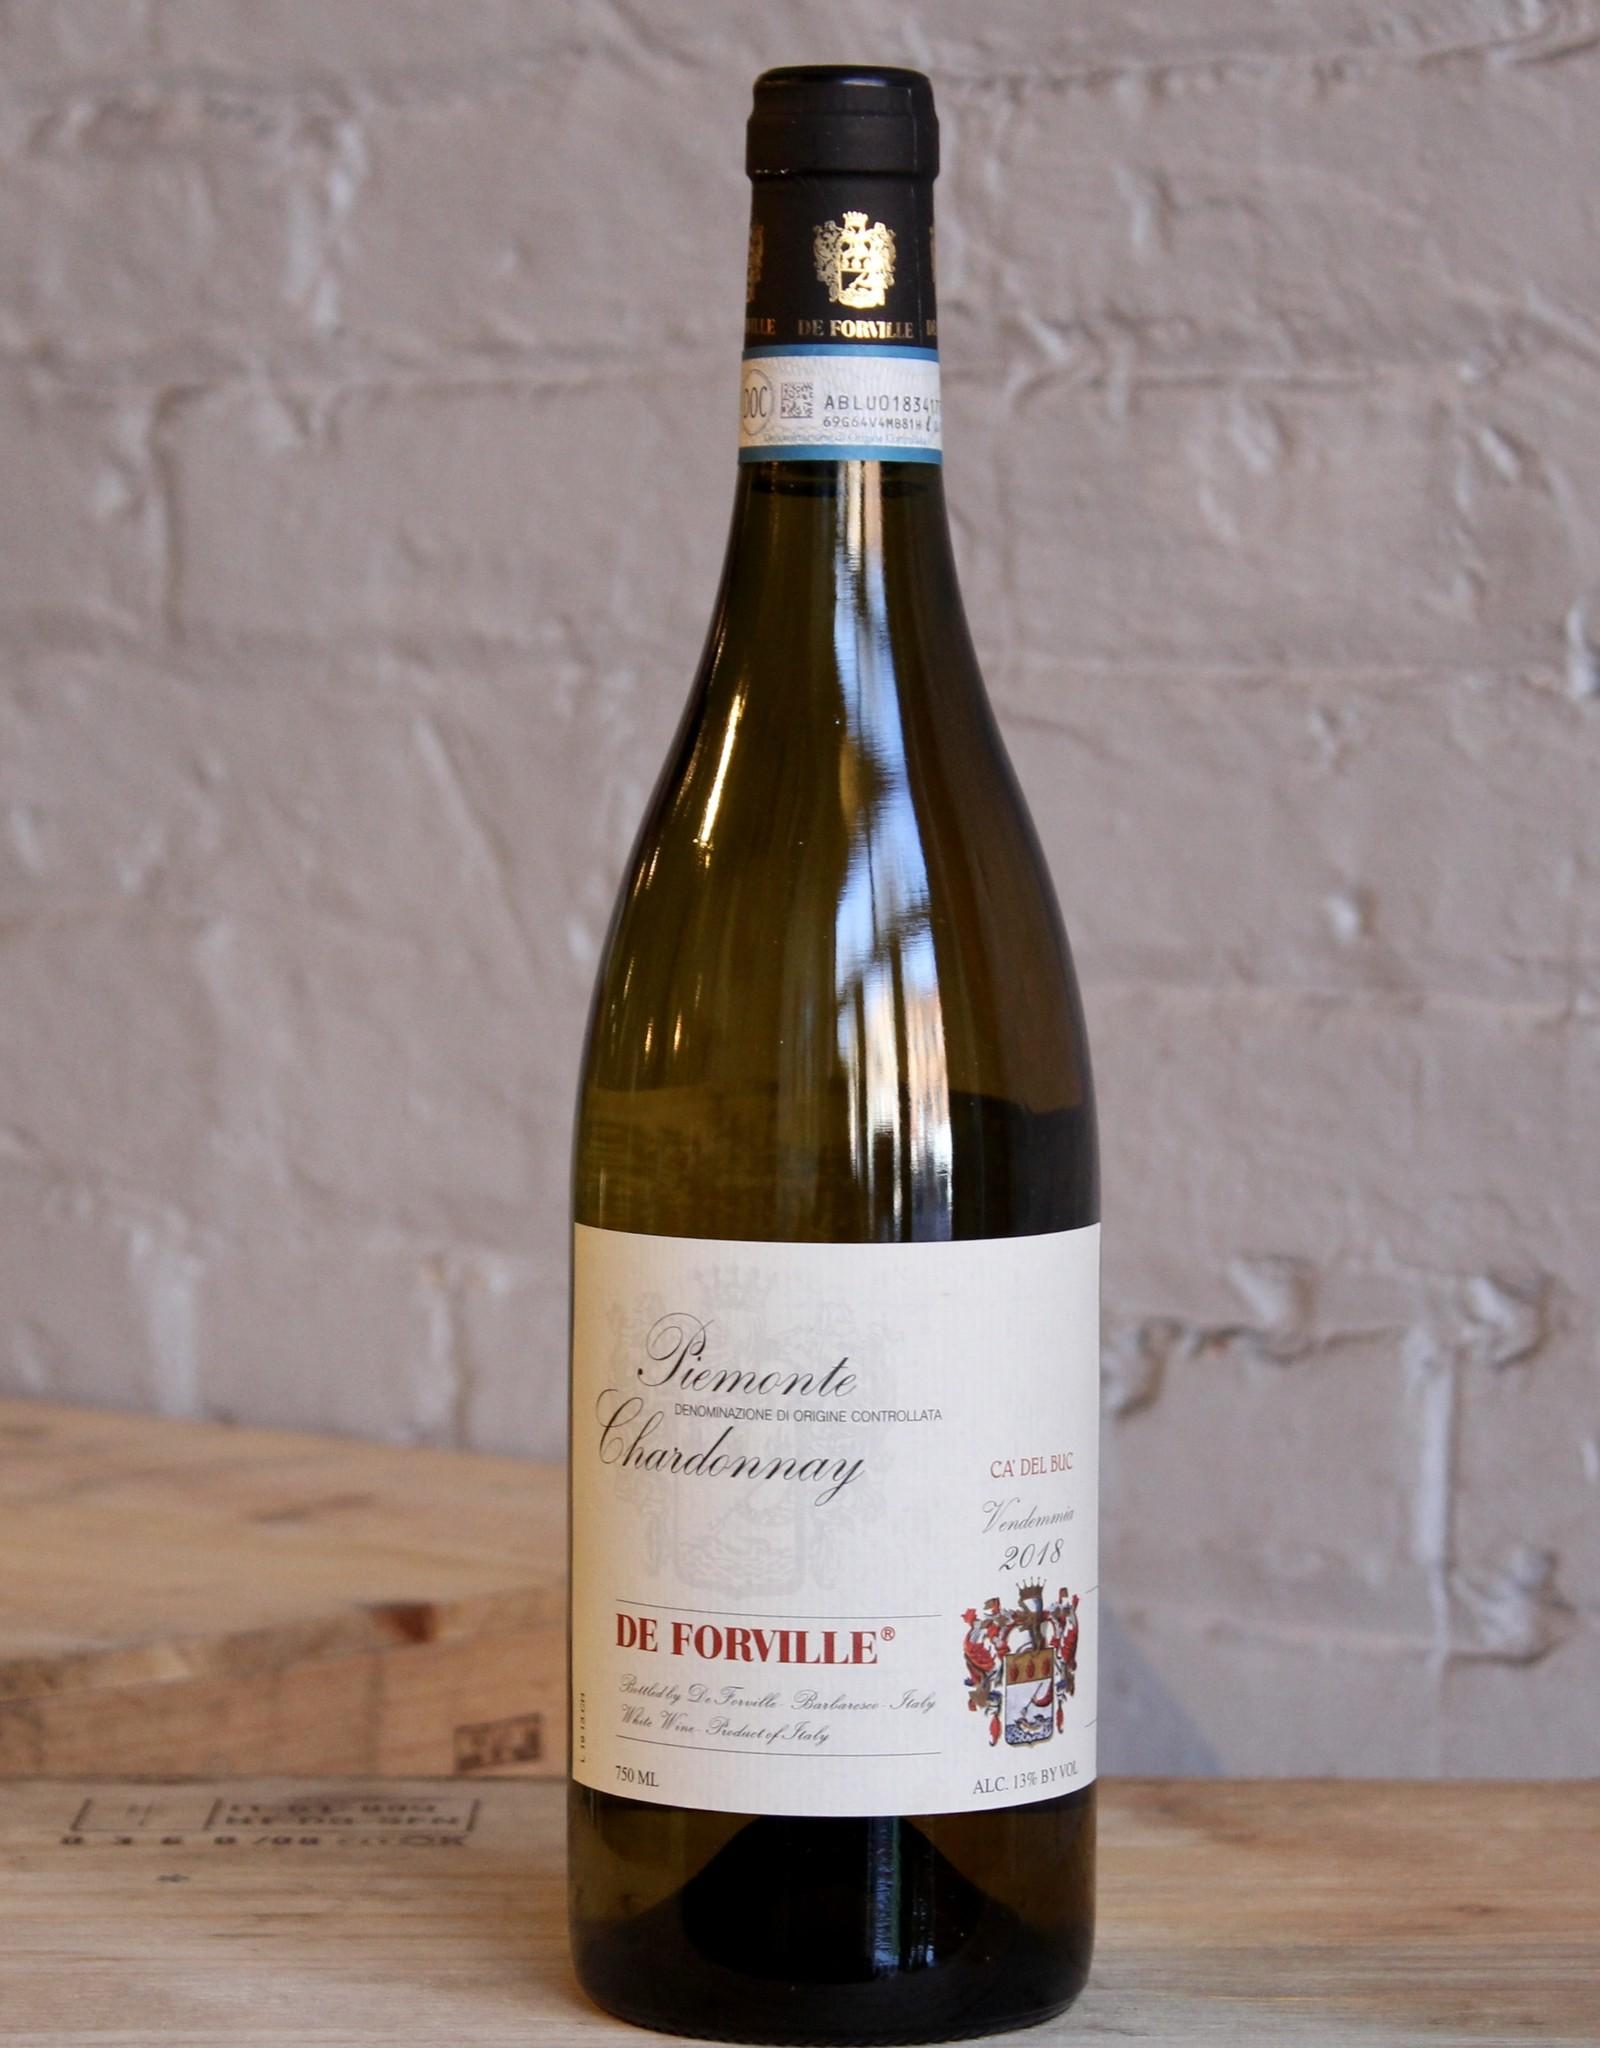 Wine 2018 De Forville Ca' del Buc Chardonnay - Piedmont, Italy (750ml)